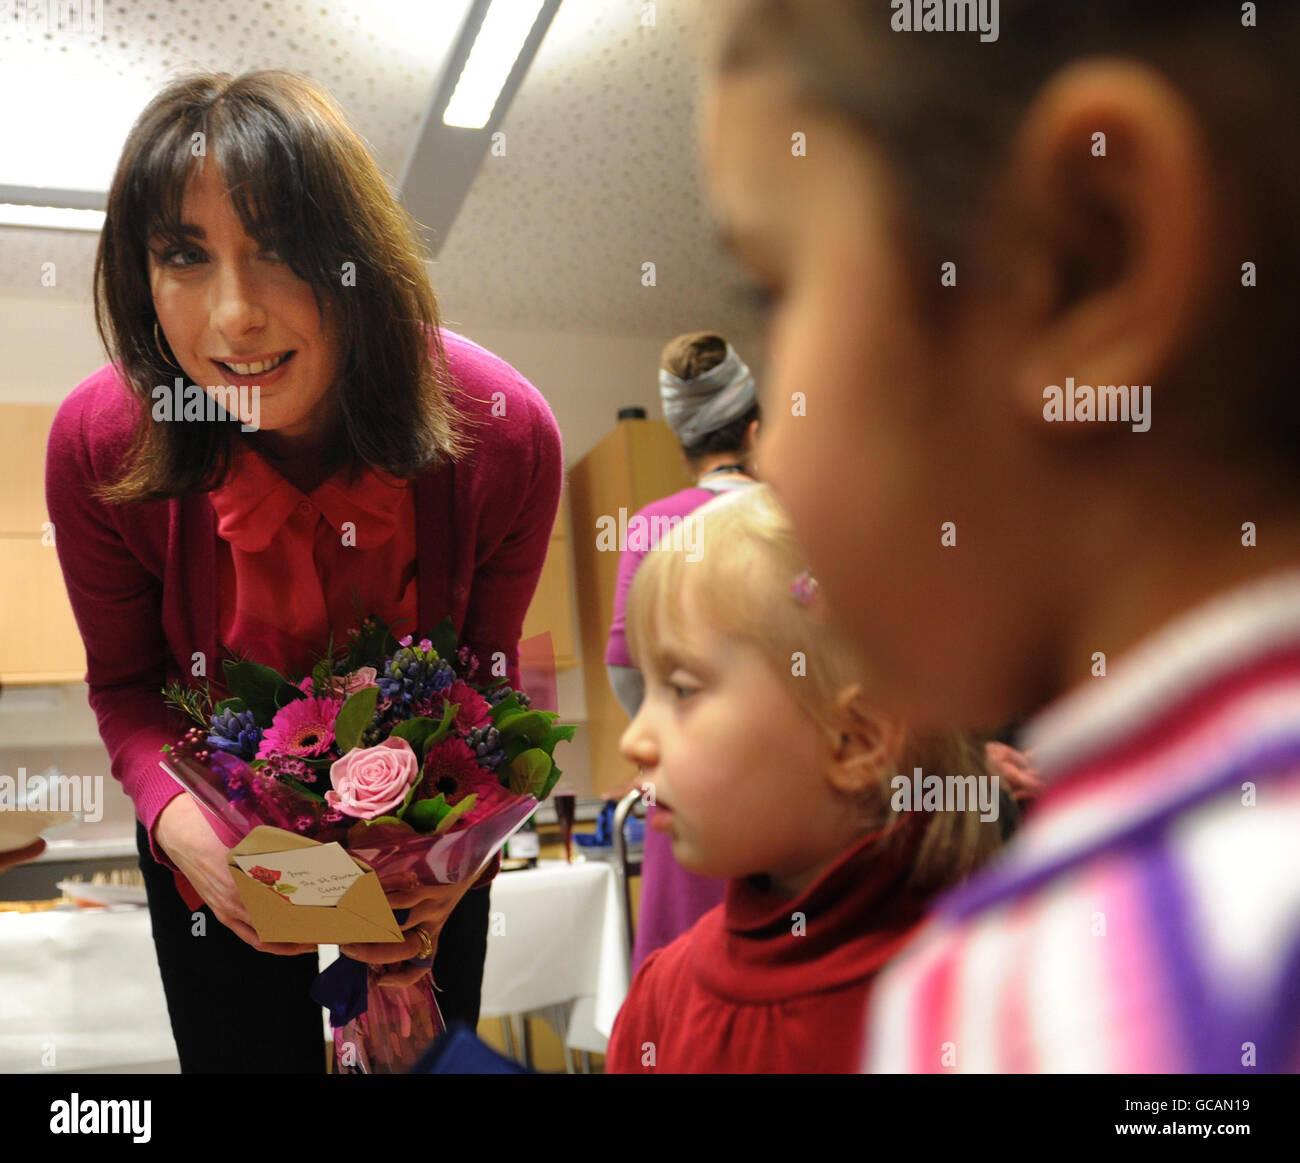 Samantha Cameron visits St Quintin Centre: Samantha Cameron, wife of Conservative leader David Cameron, meets children - Stock Image